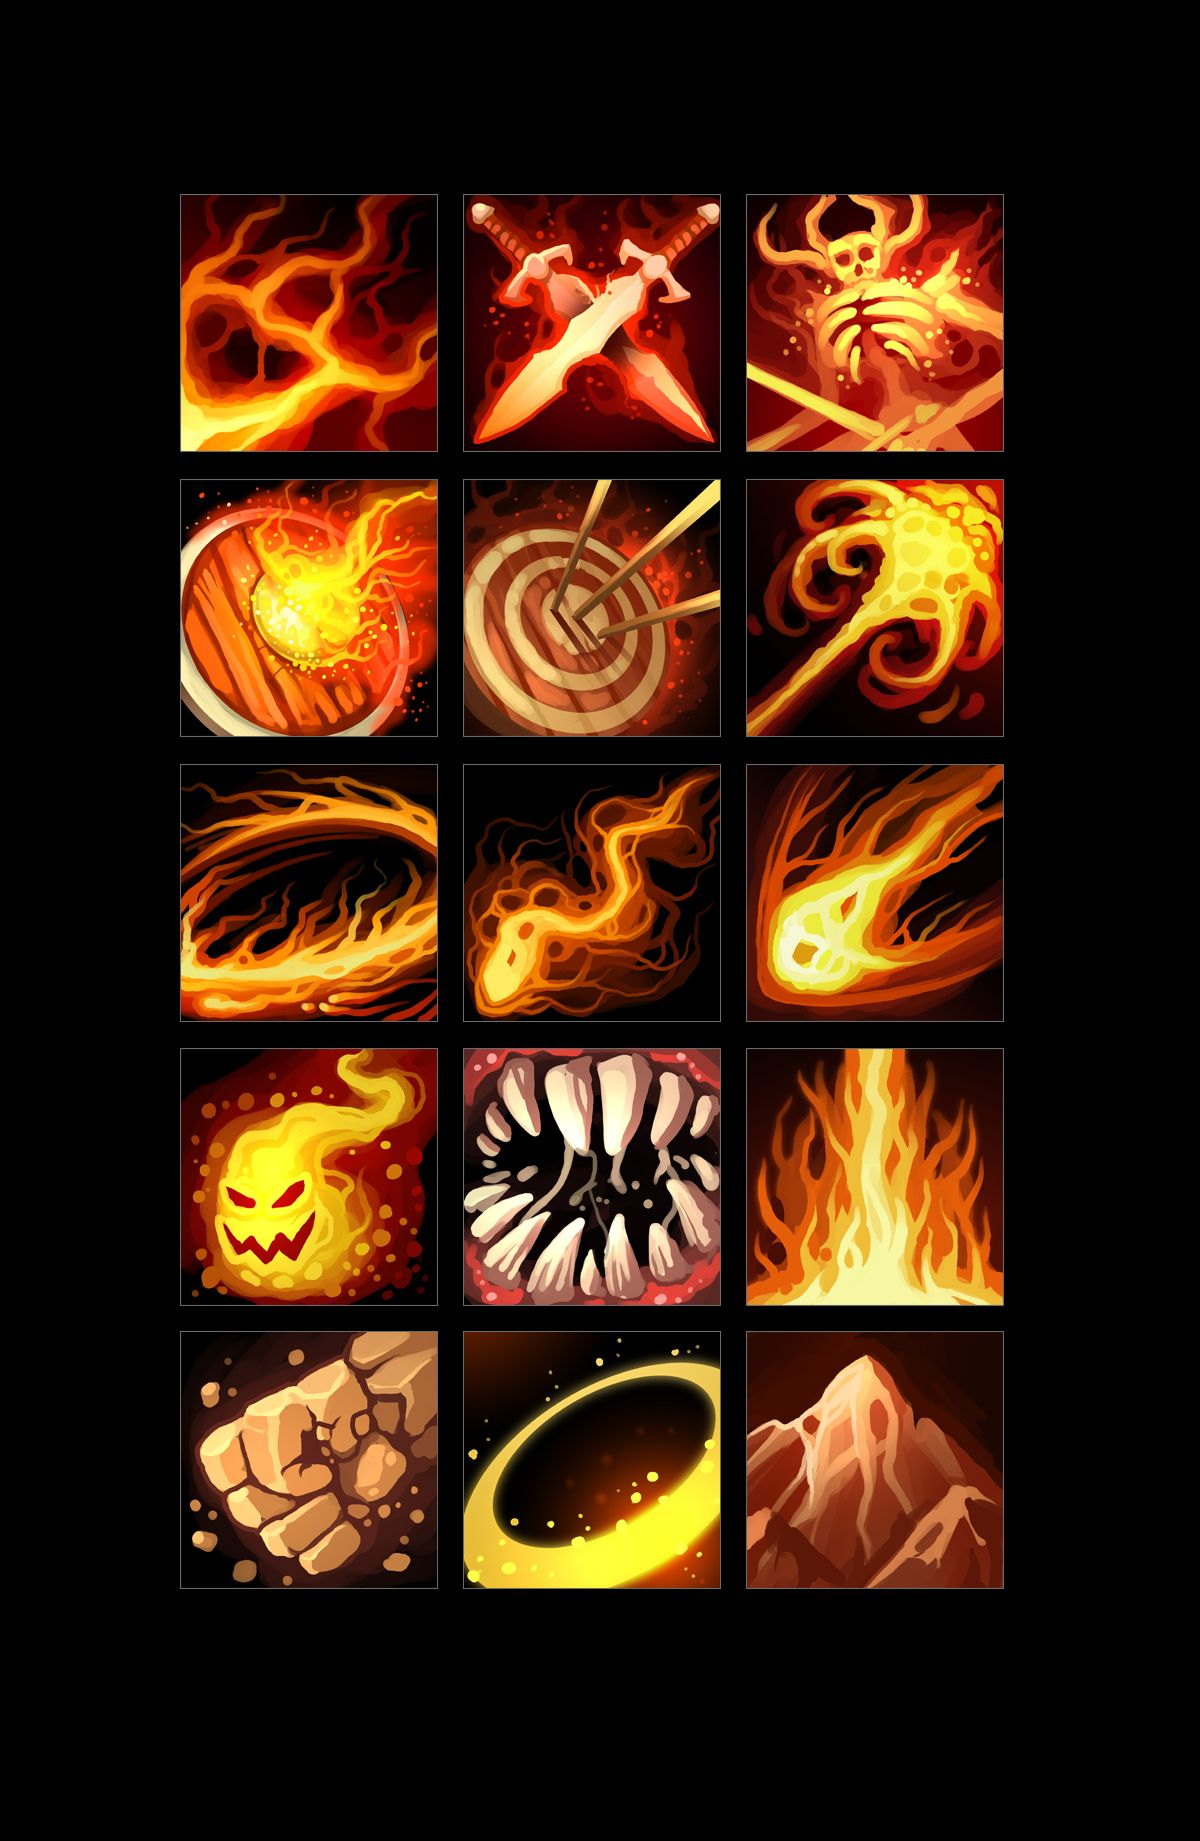 Rpg Skills Icons 01 Game Concept Art Graphic Design Fun Game Art